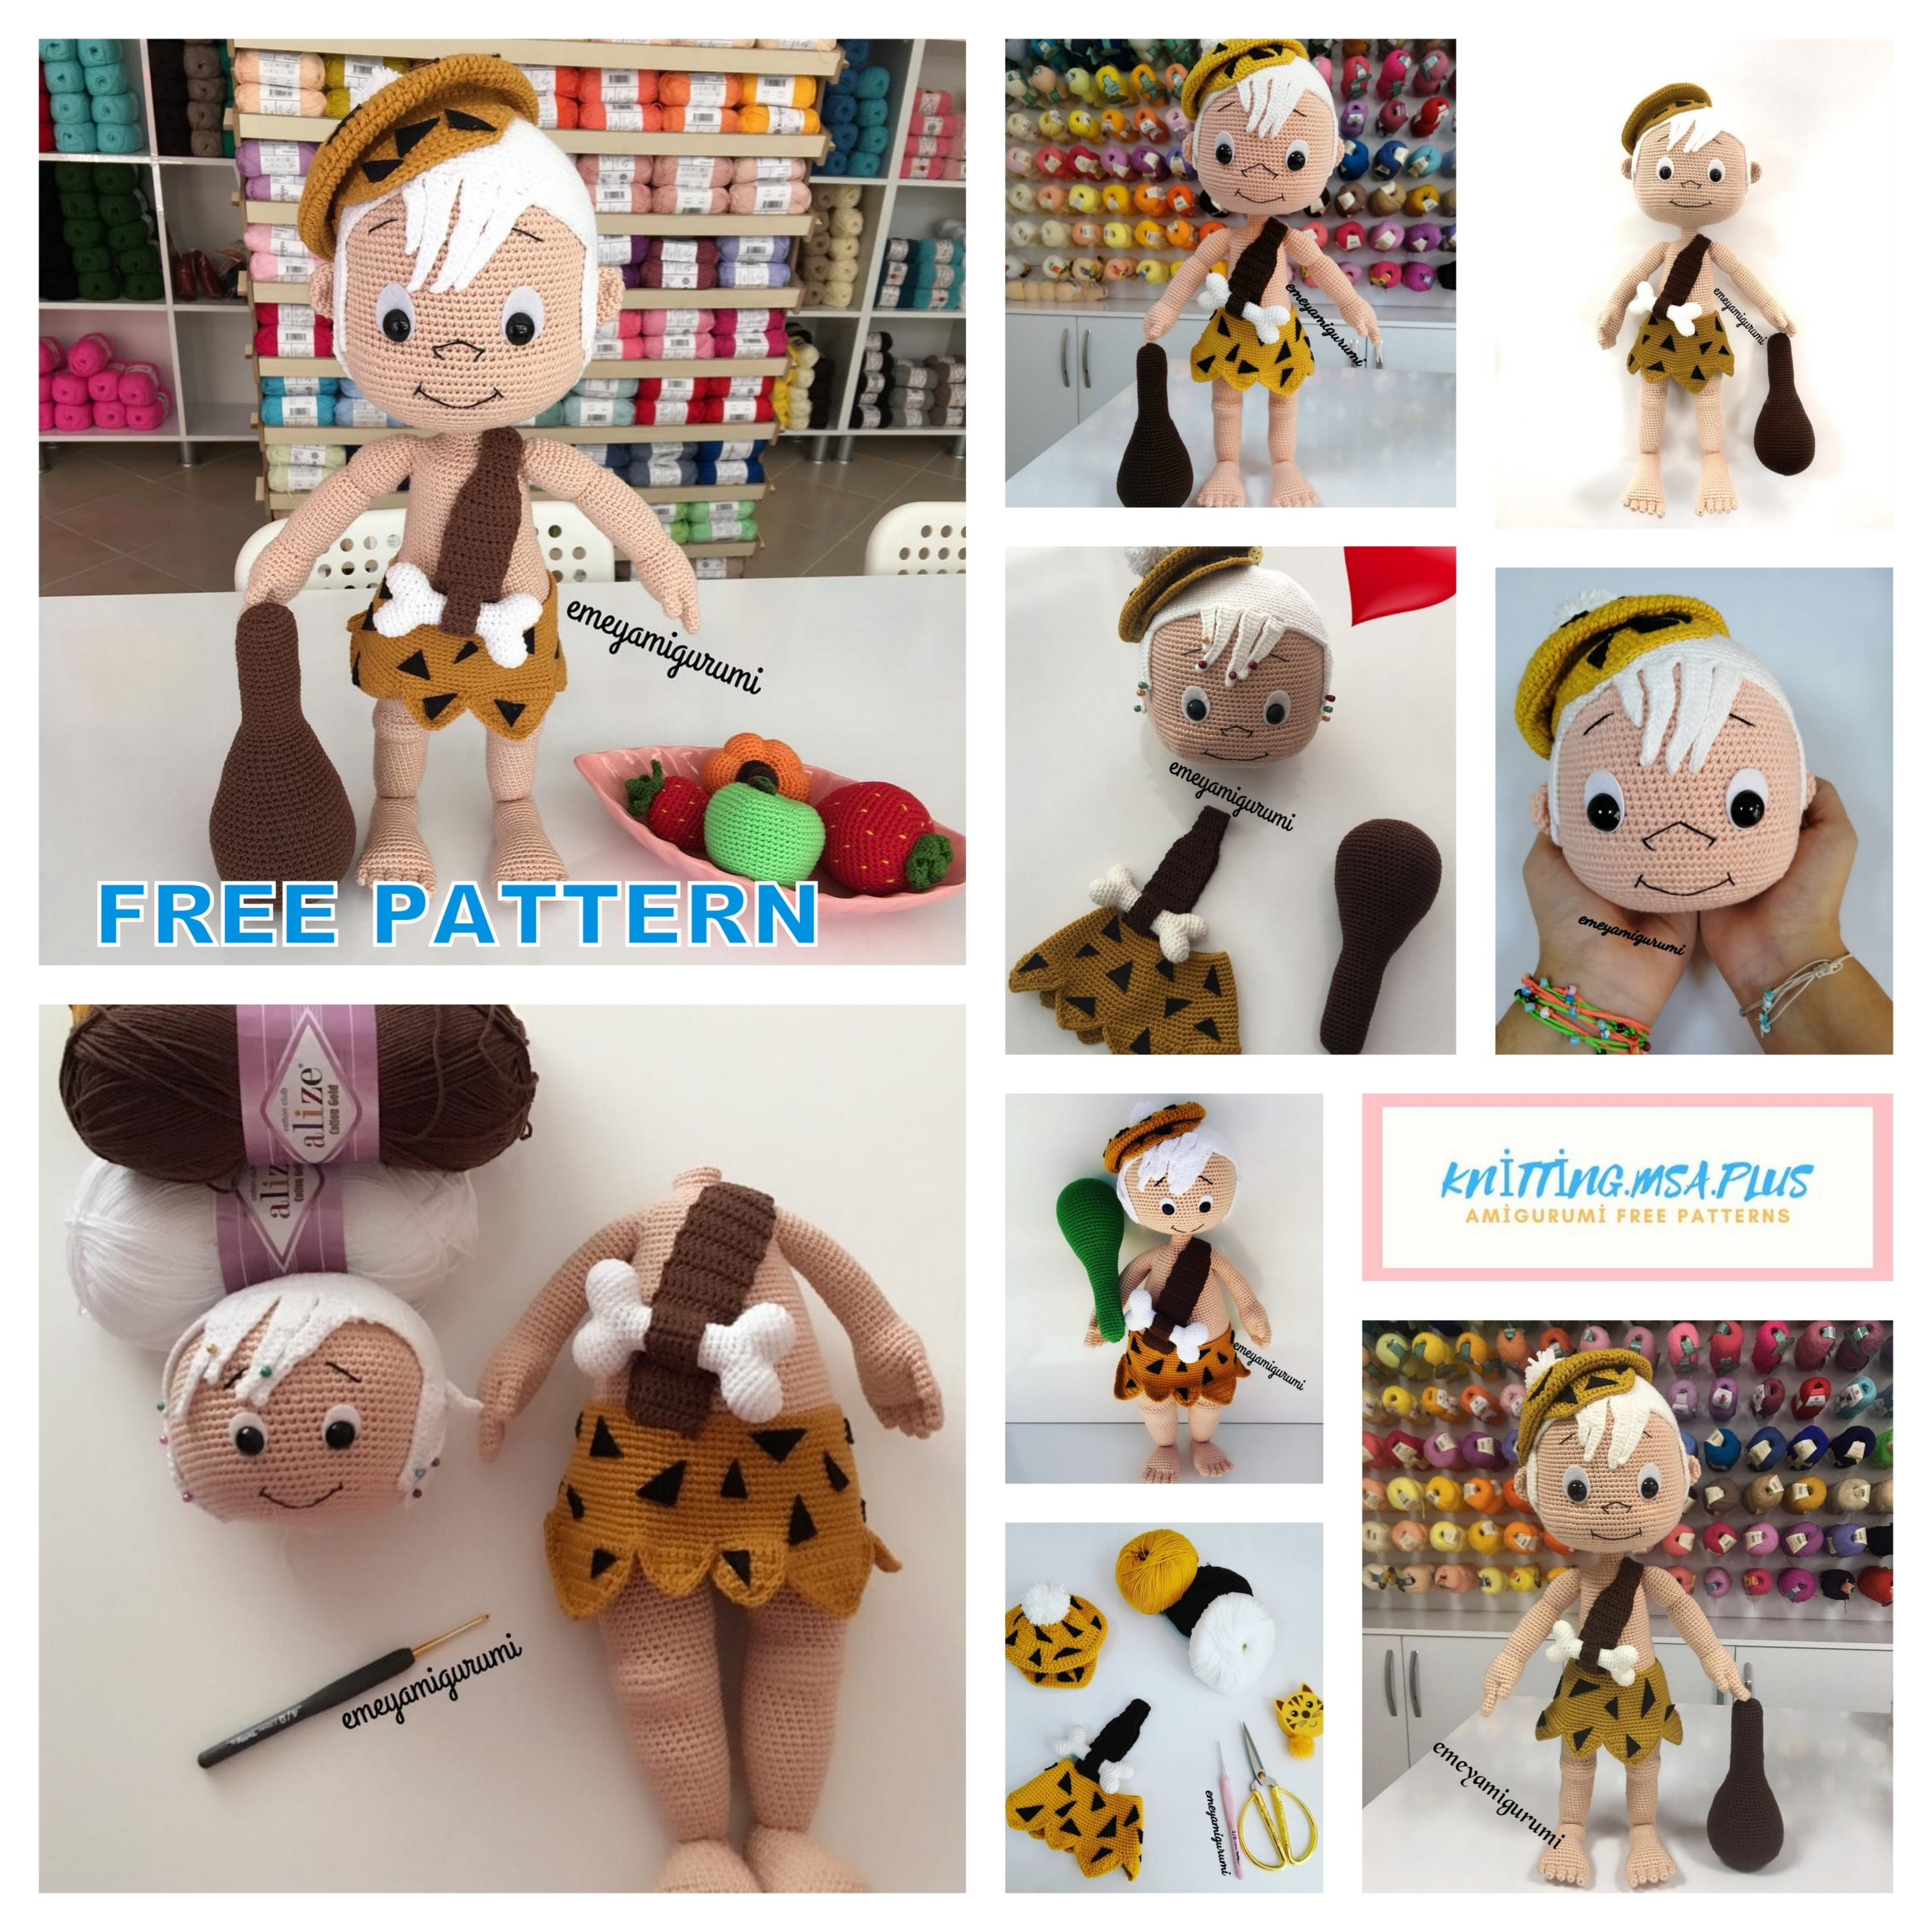 Amigurumi Bambam Free Crochet Pattern